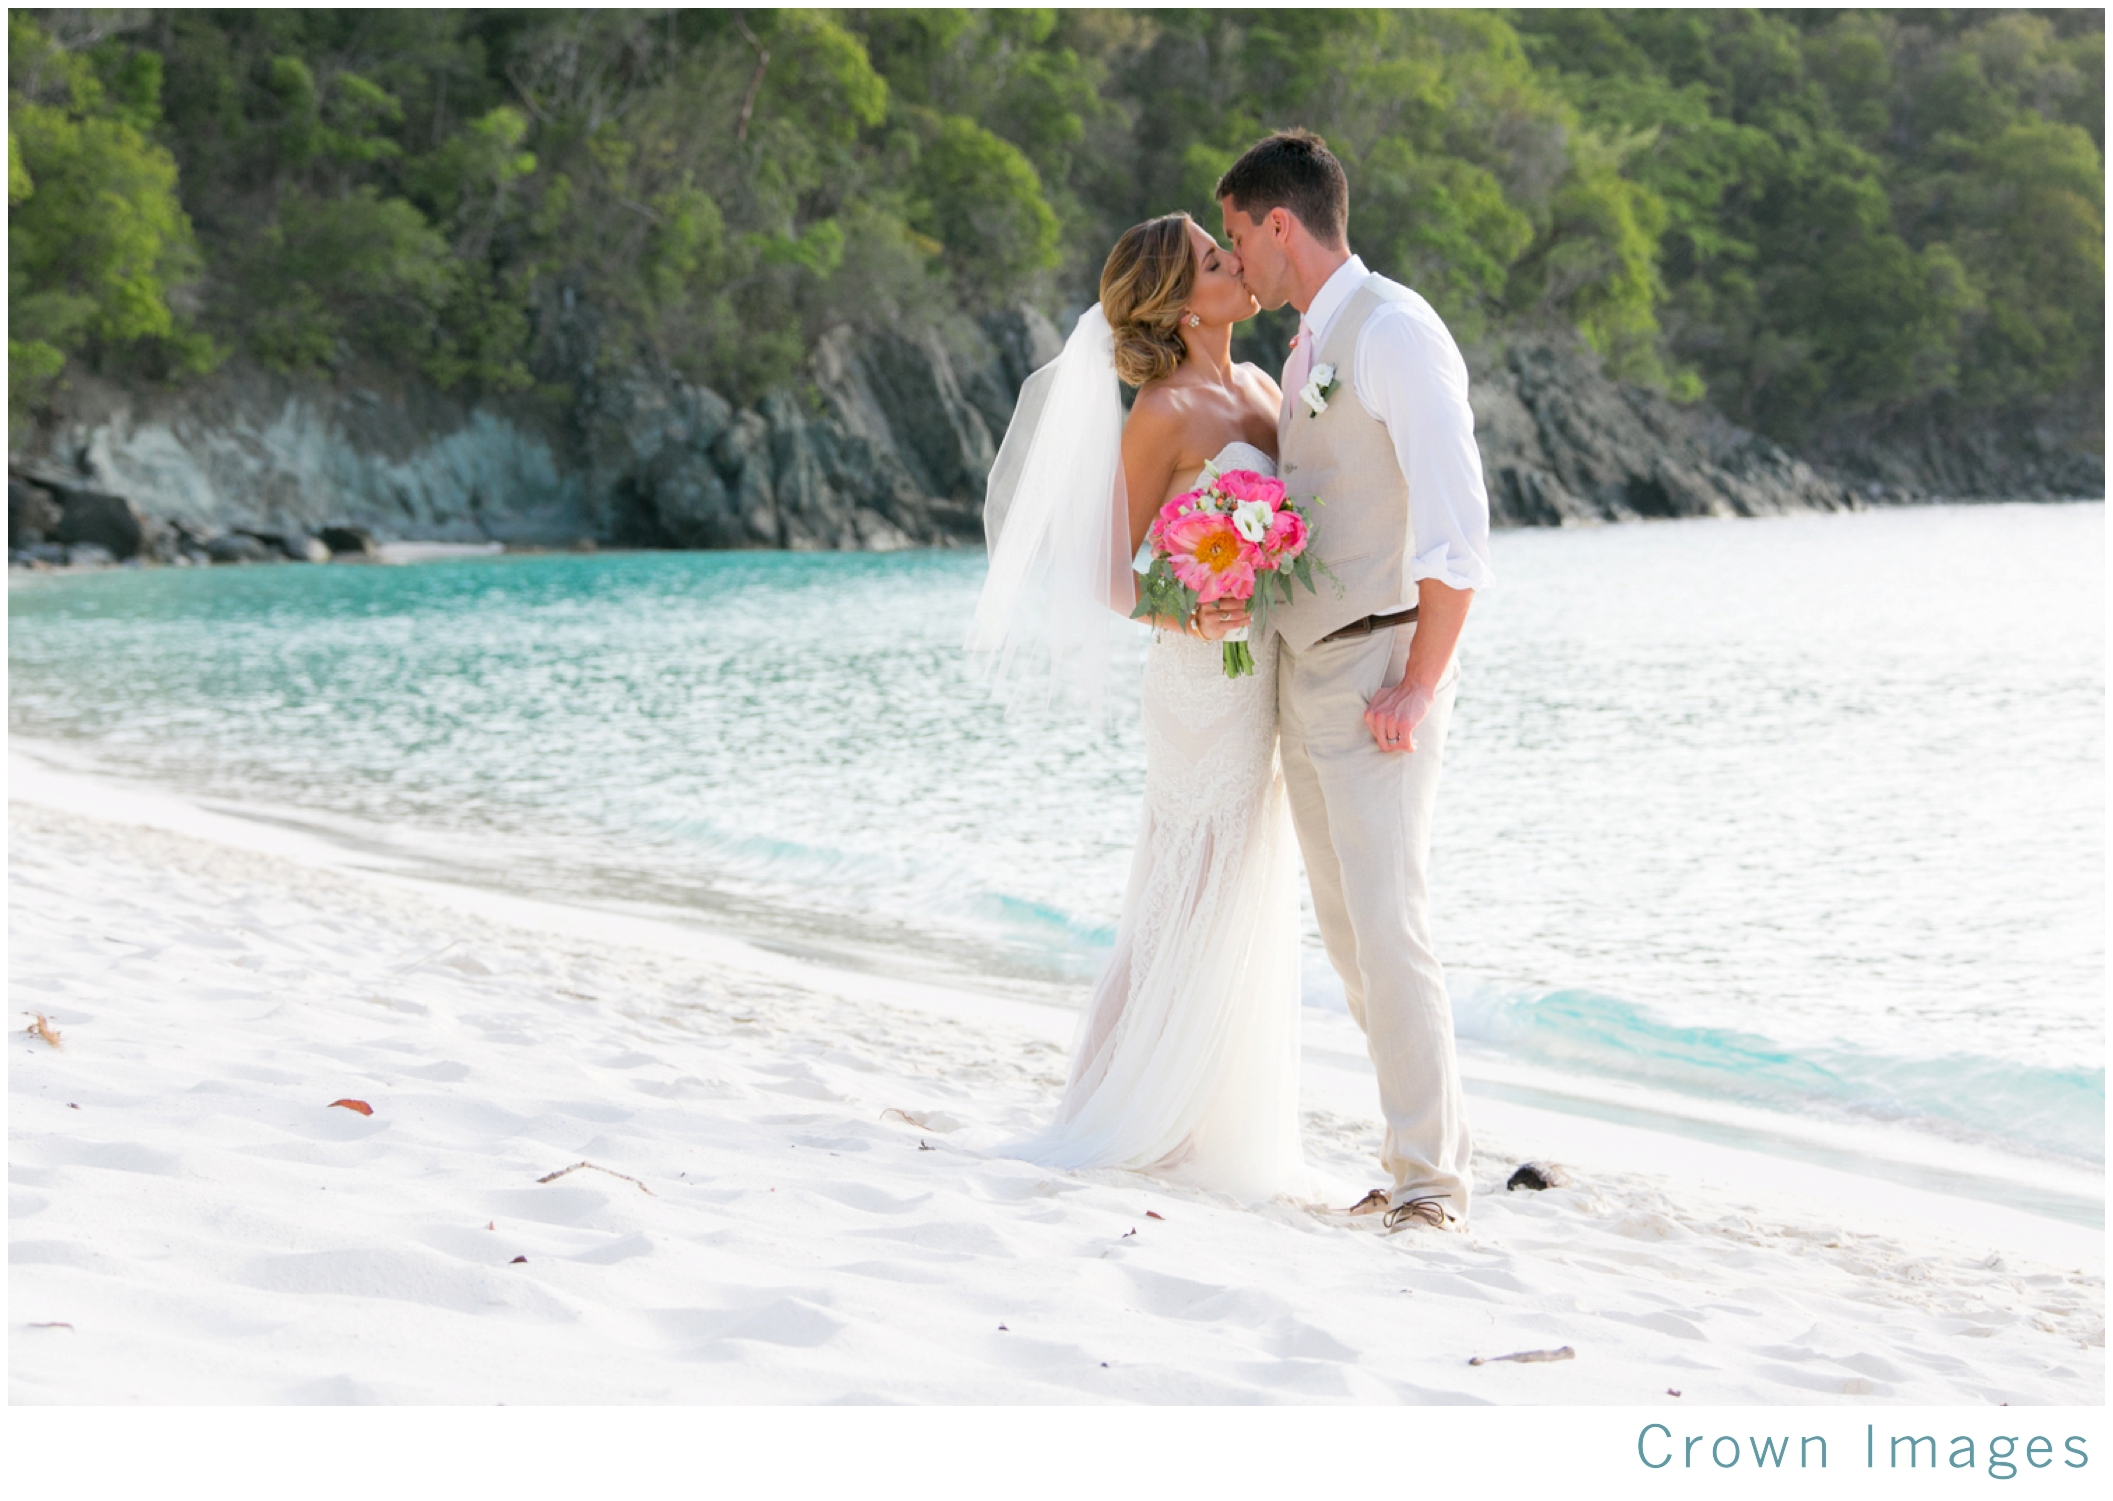 wedding photos crown images_1668.jpg